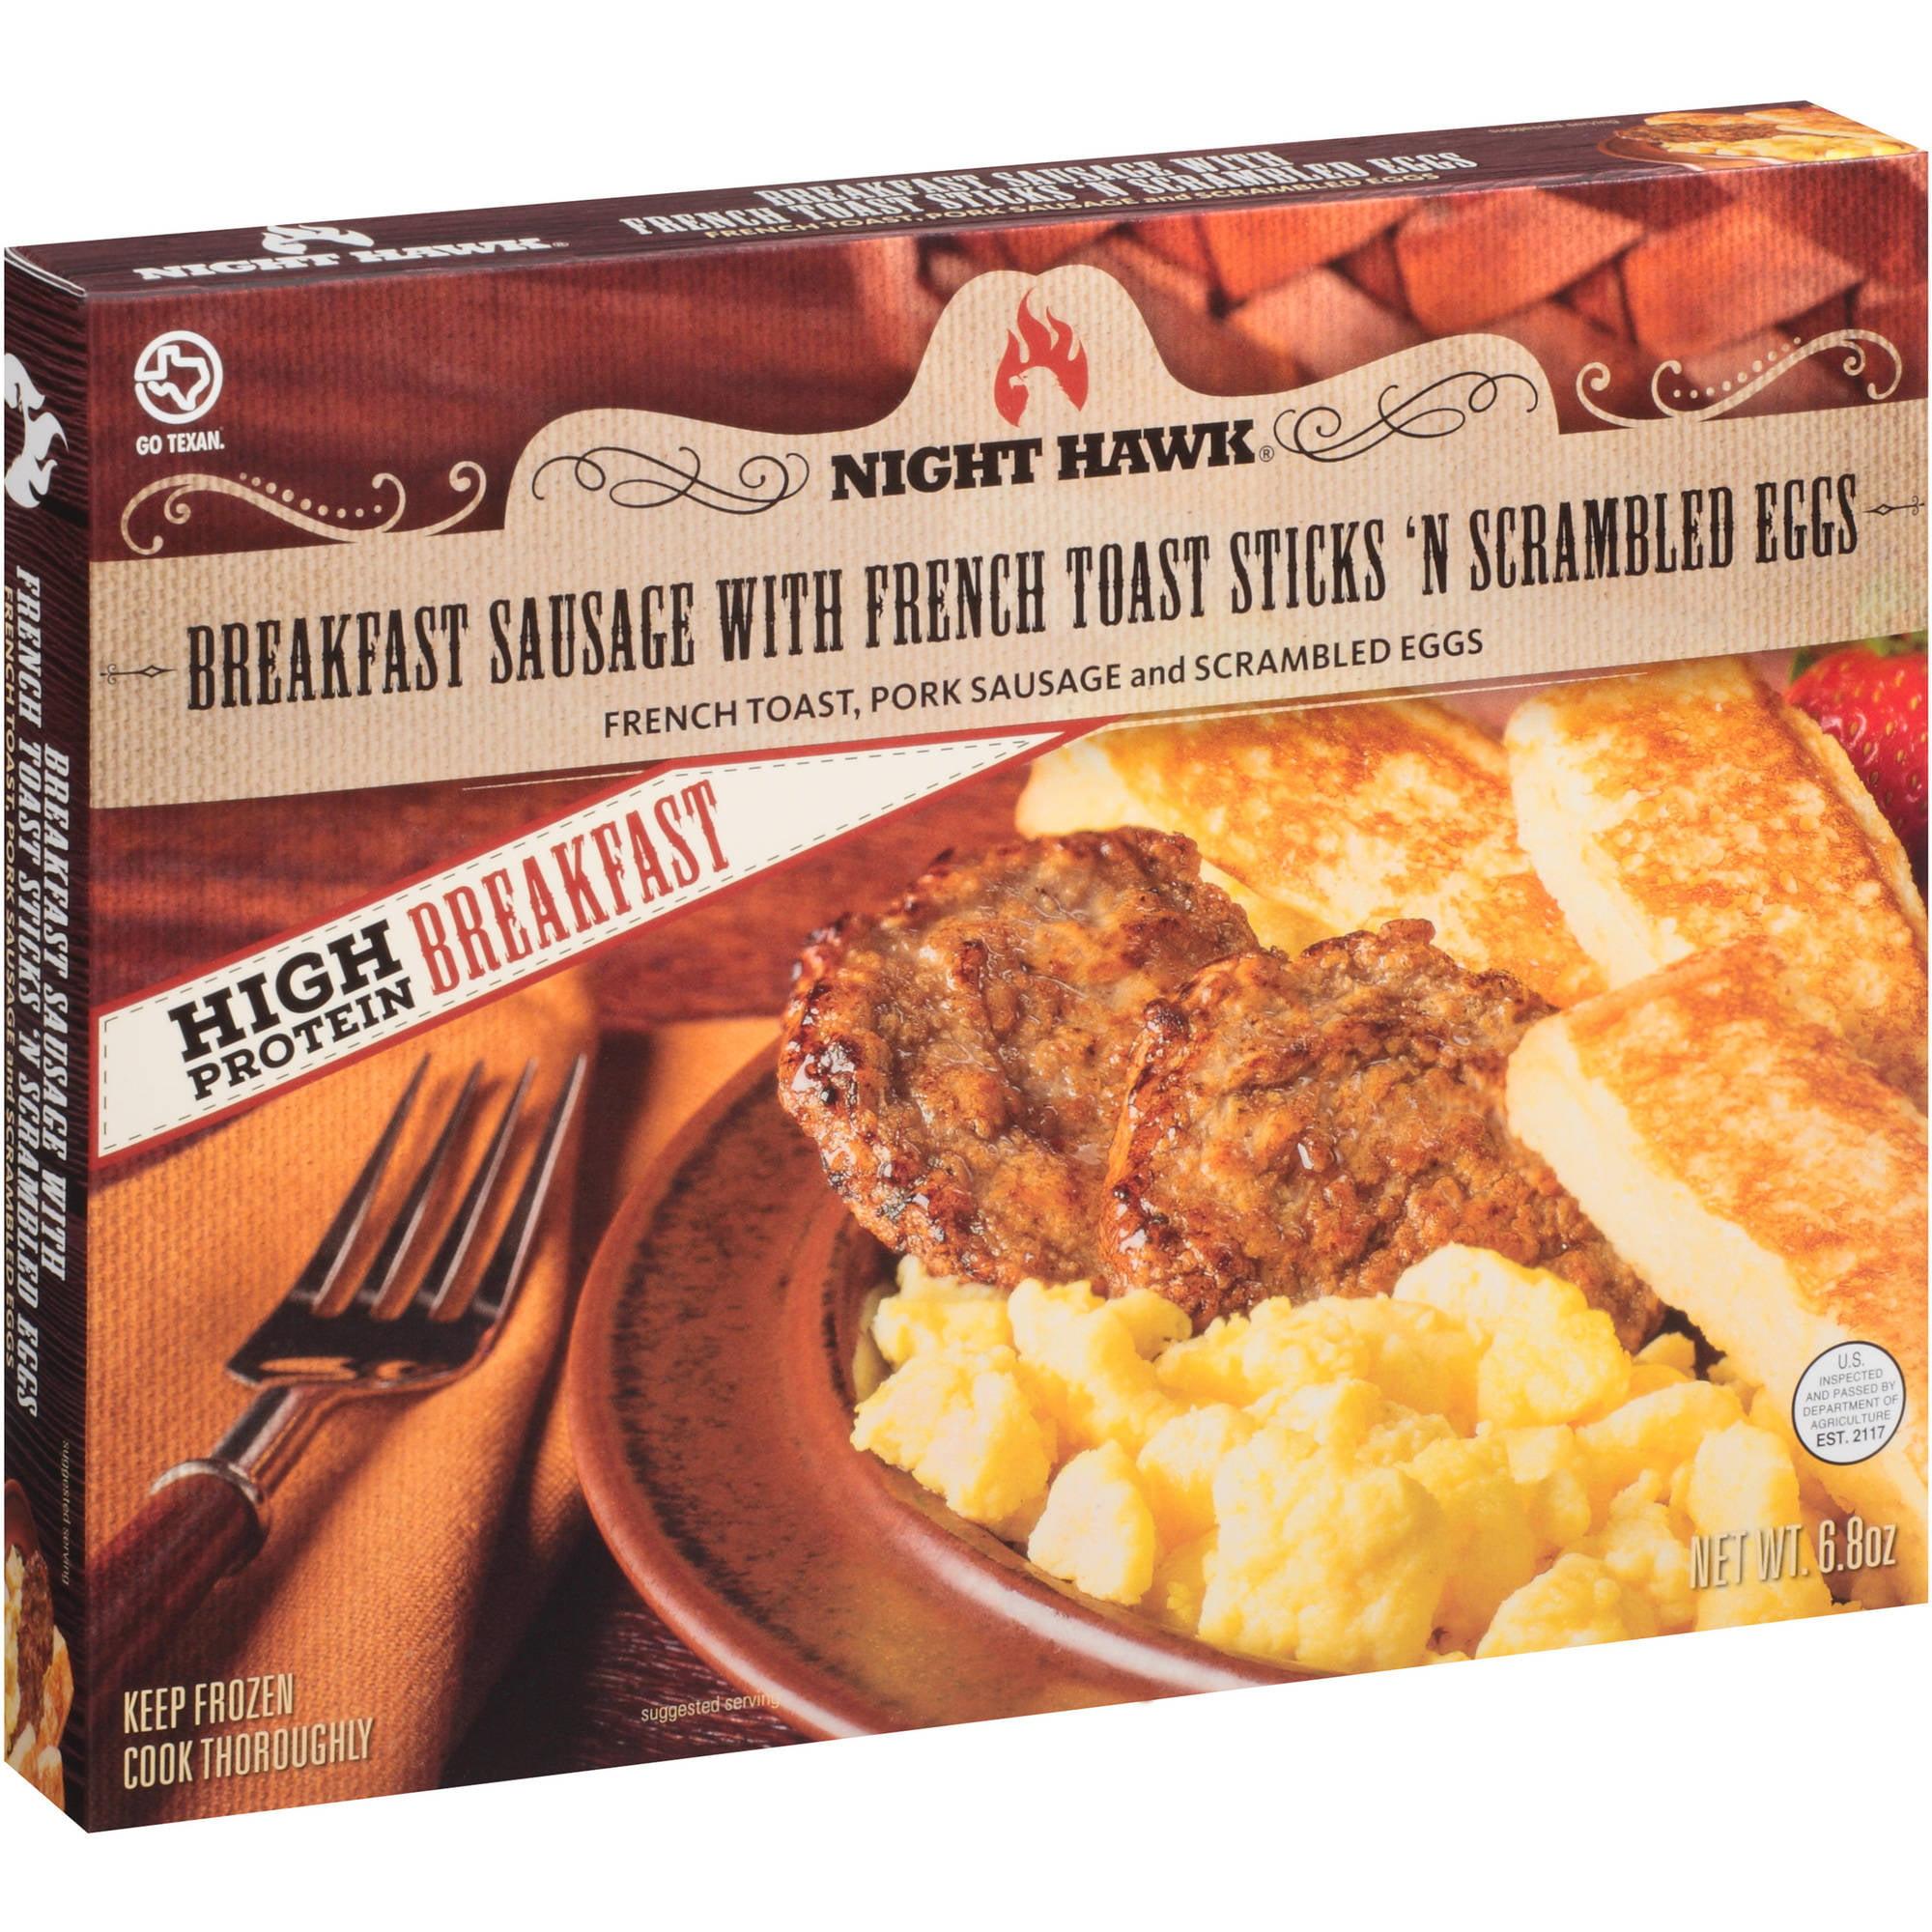 Night Hawk Breakfast Sausage with French Toast Sticks 'N Scrambled Eggs Frozen Entree, 6.8 oz